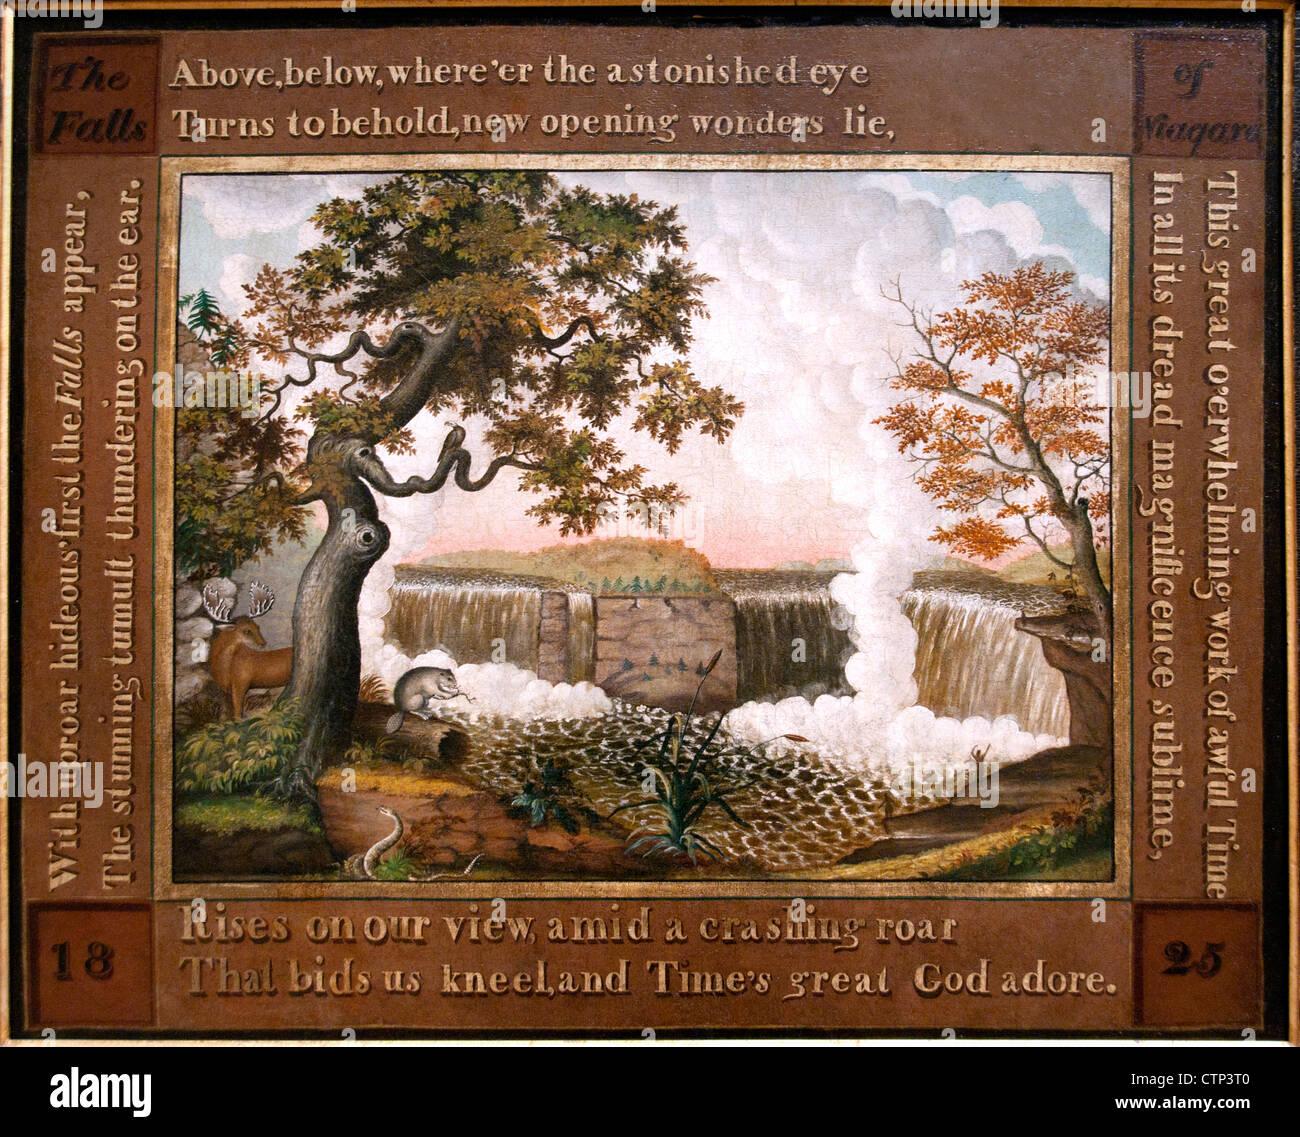 The Falls of Niagara 1825 Edward Hicks American United States of America - Stock Image